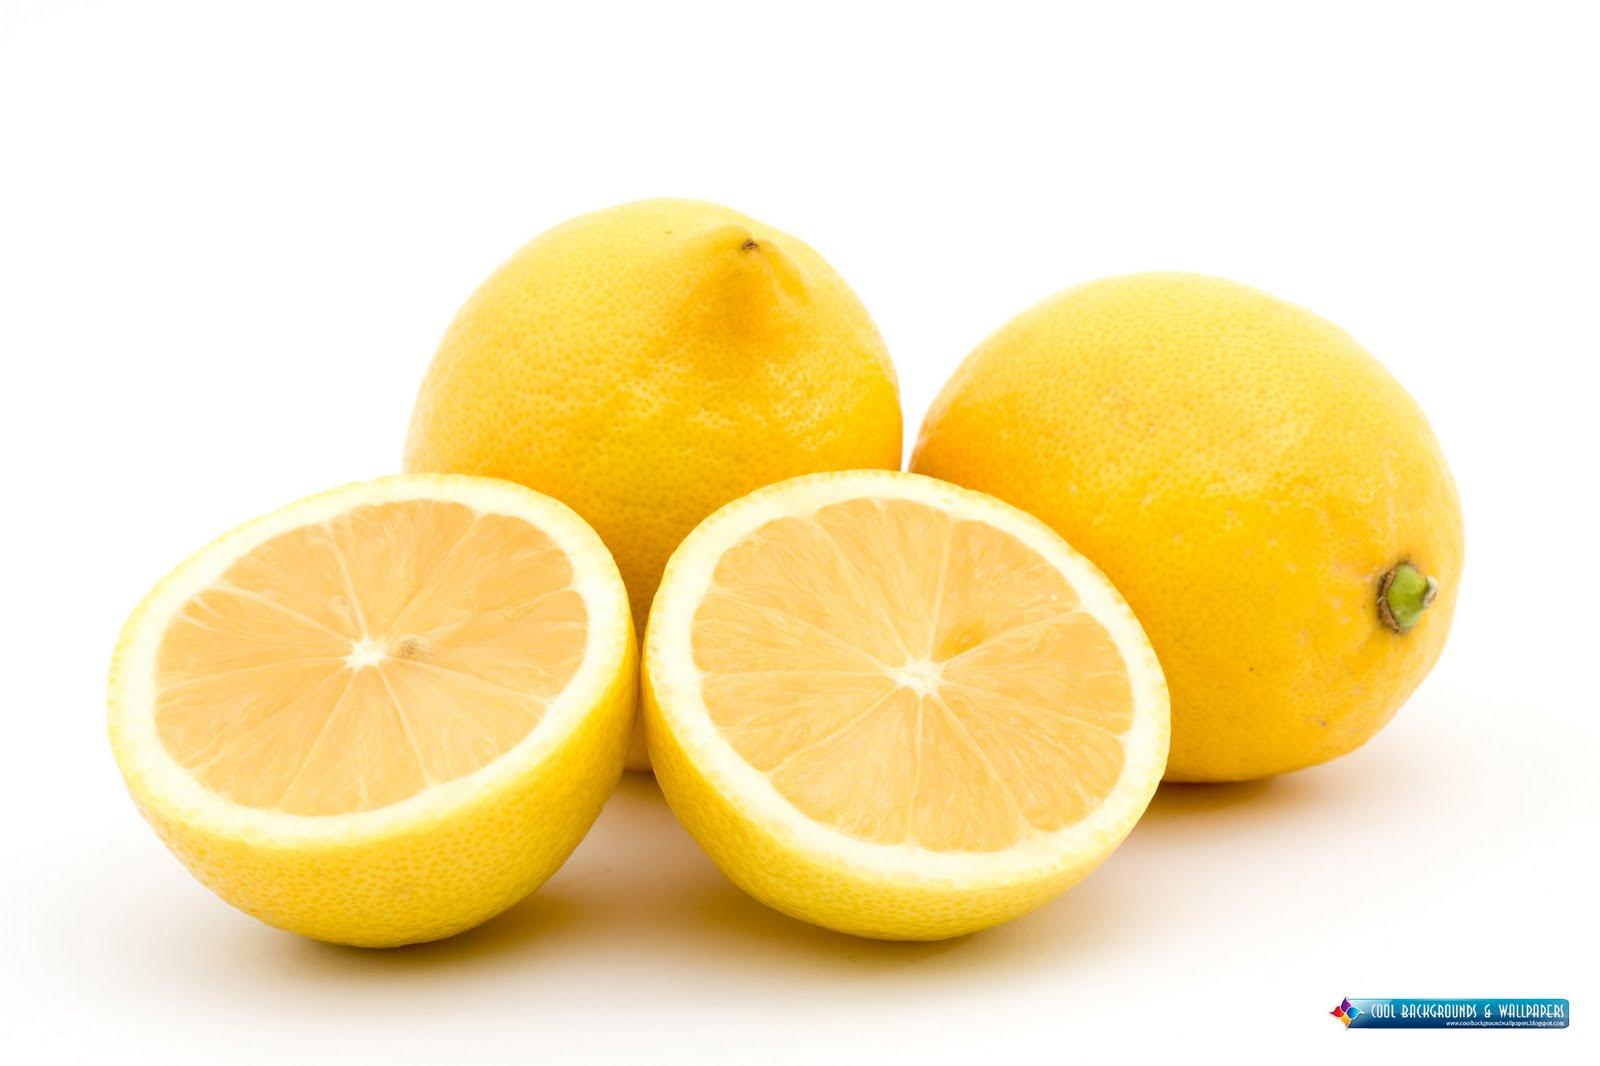 Fresh lemon hd wallpapers hairstyle qoutes tattoo